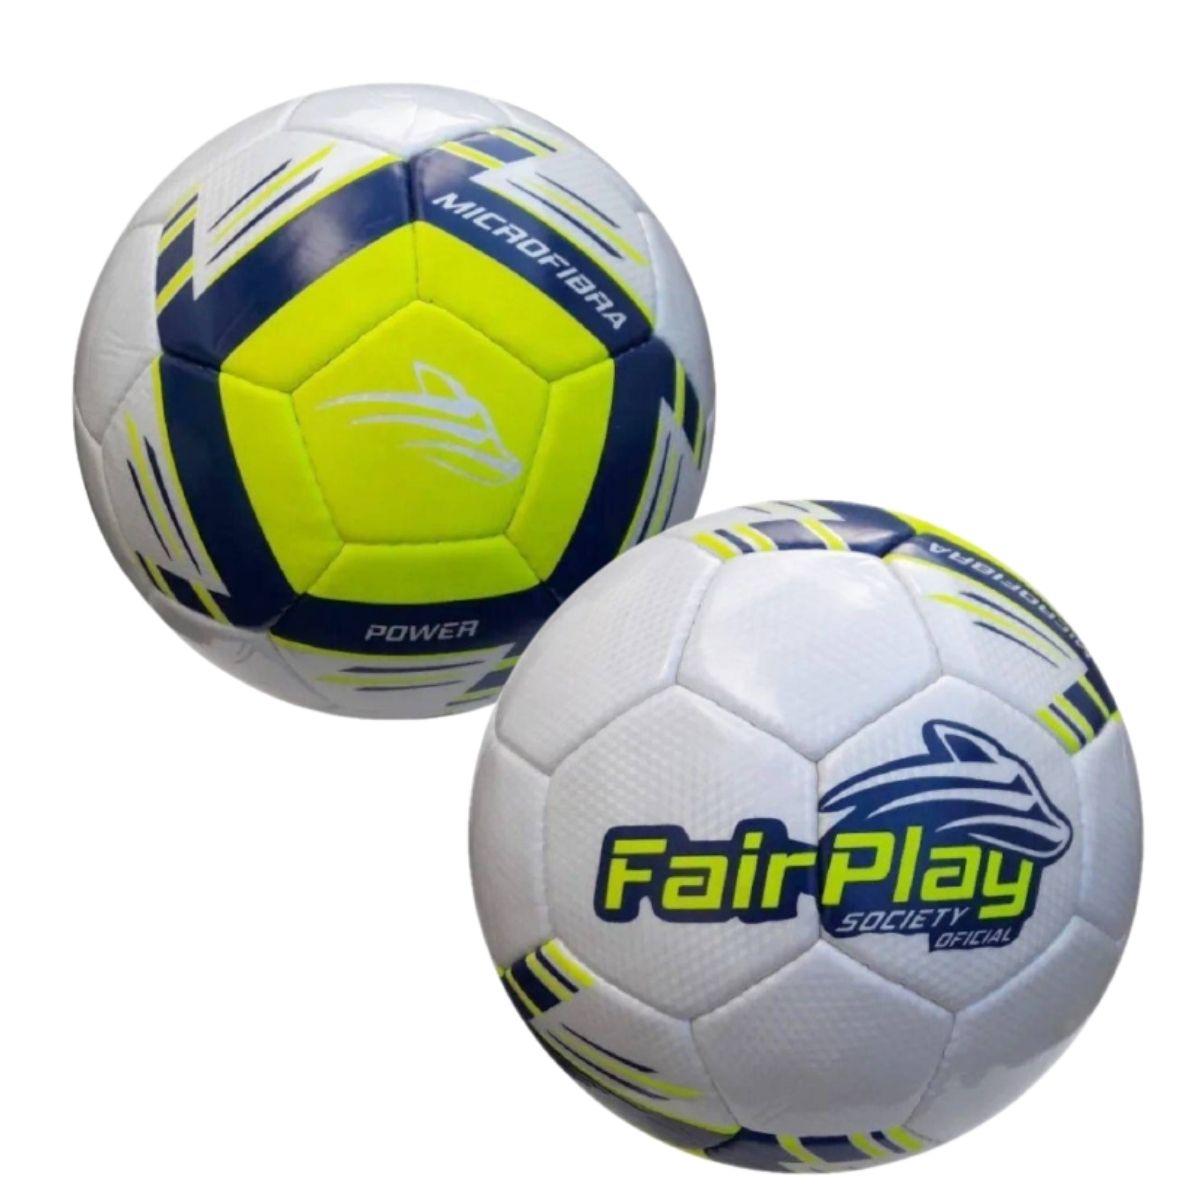 Kit 2 Bolas Futebol Society Fairplay Power